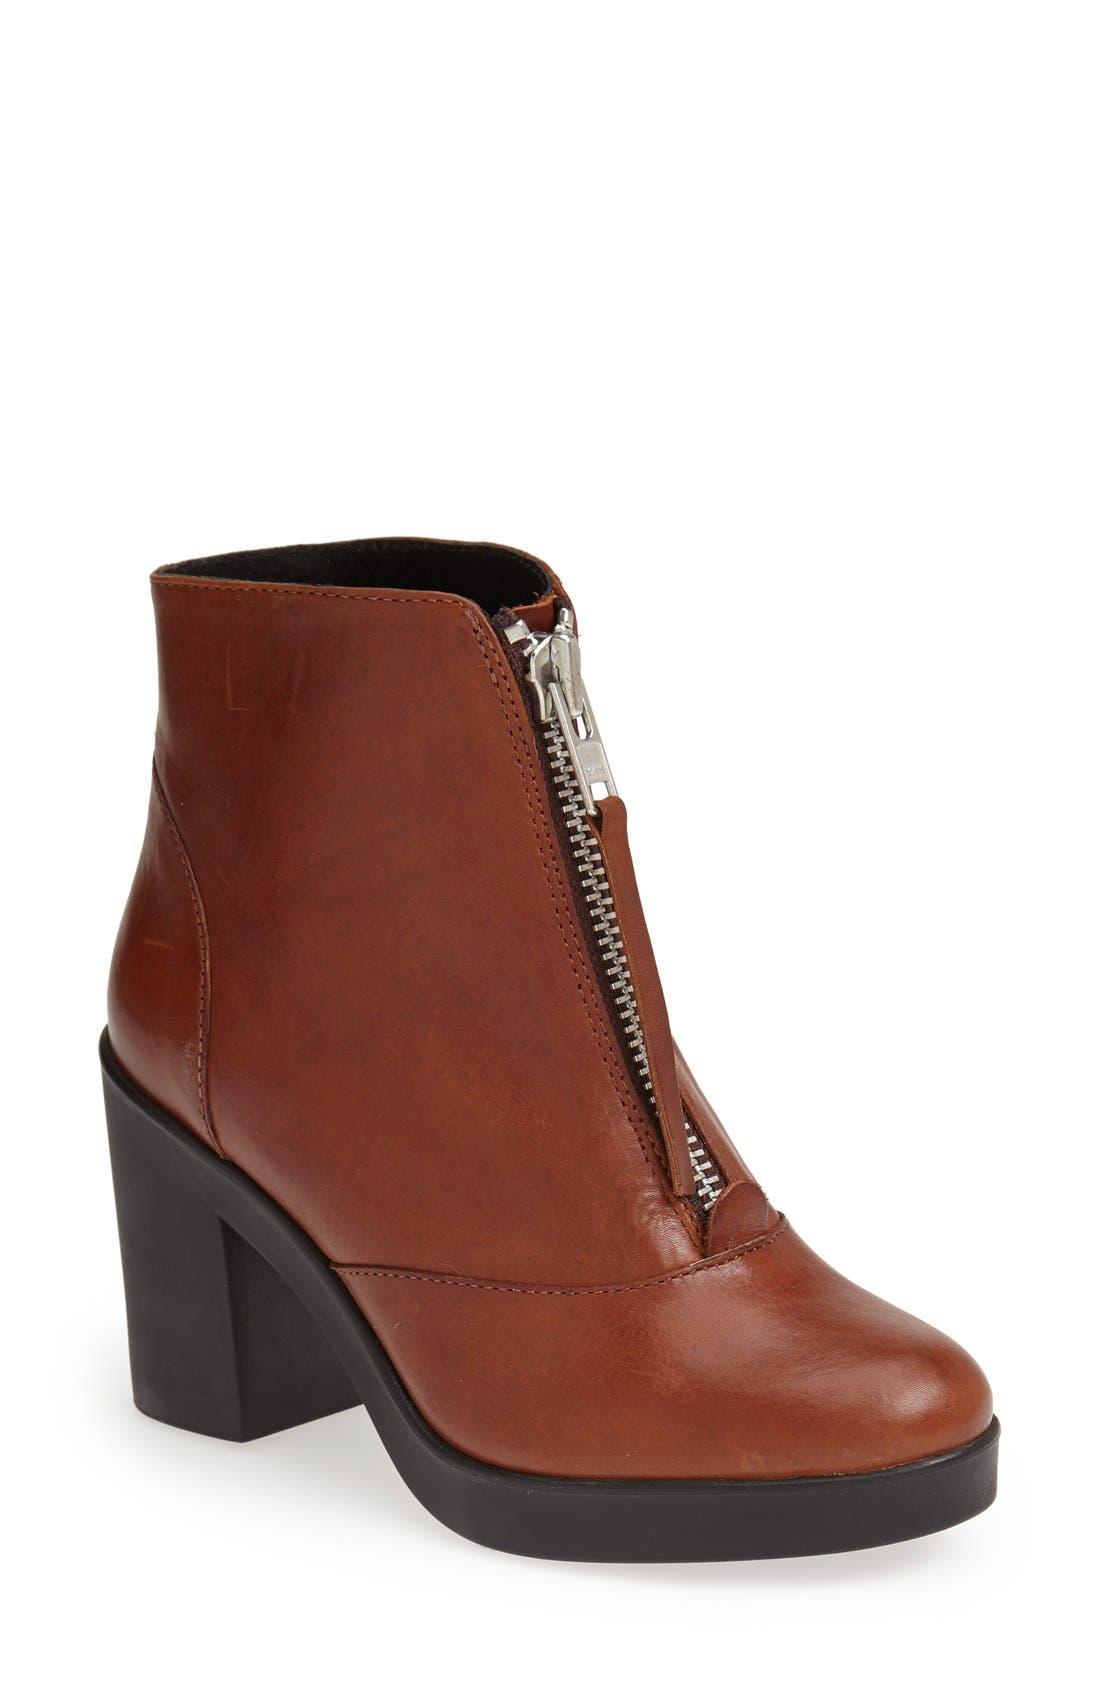 Main Image - Topshop 'Magic' Ankle Boot (Women)